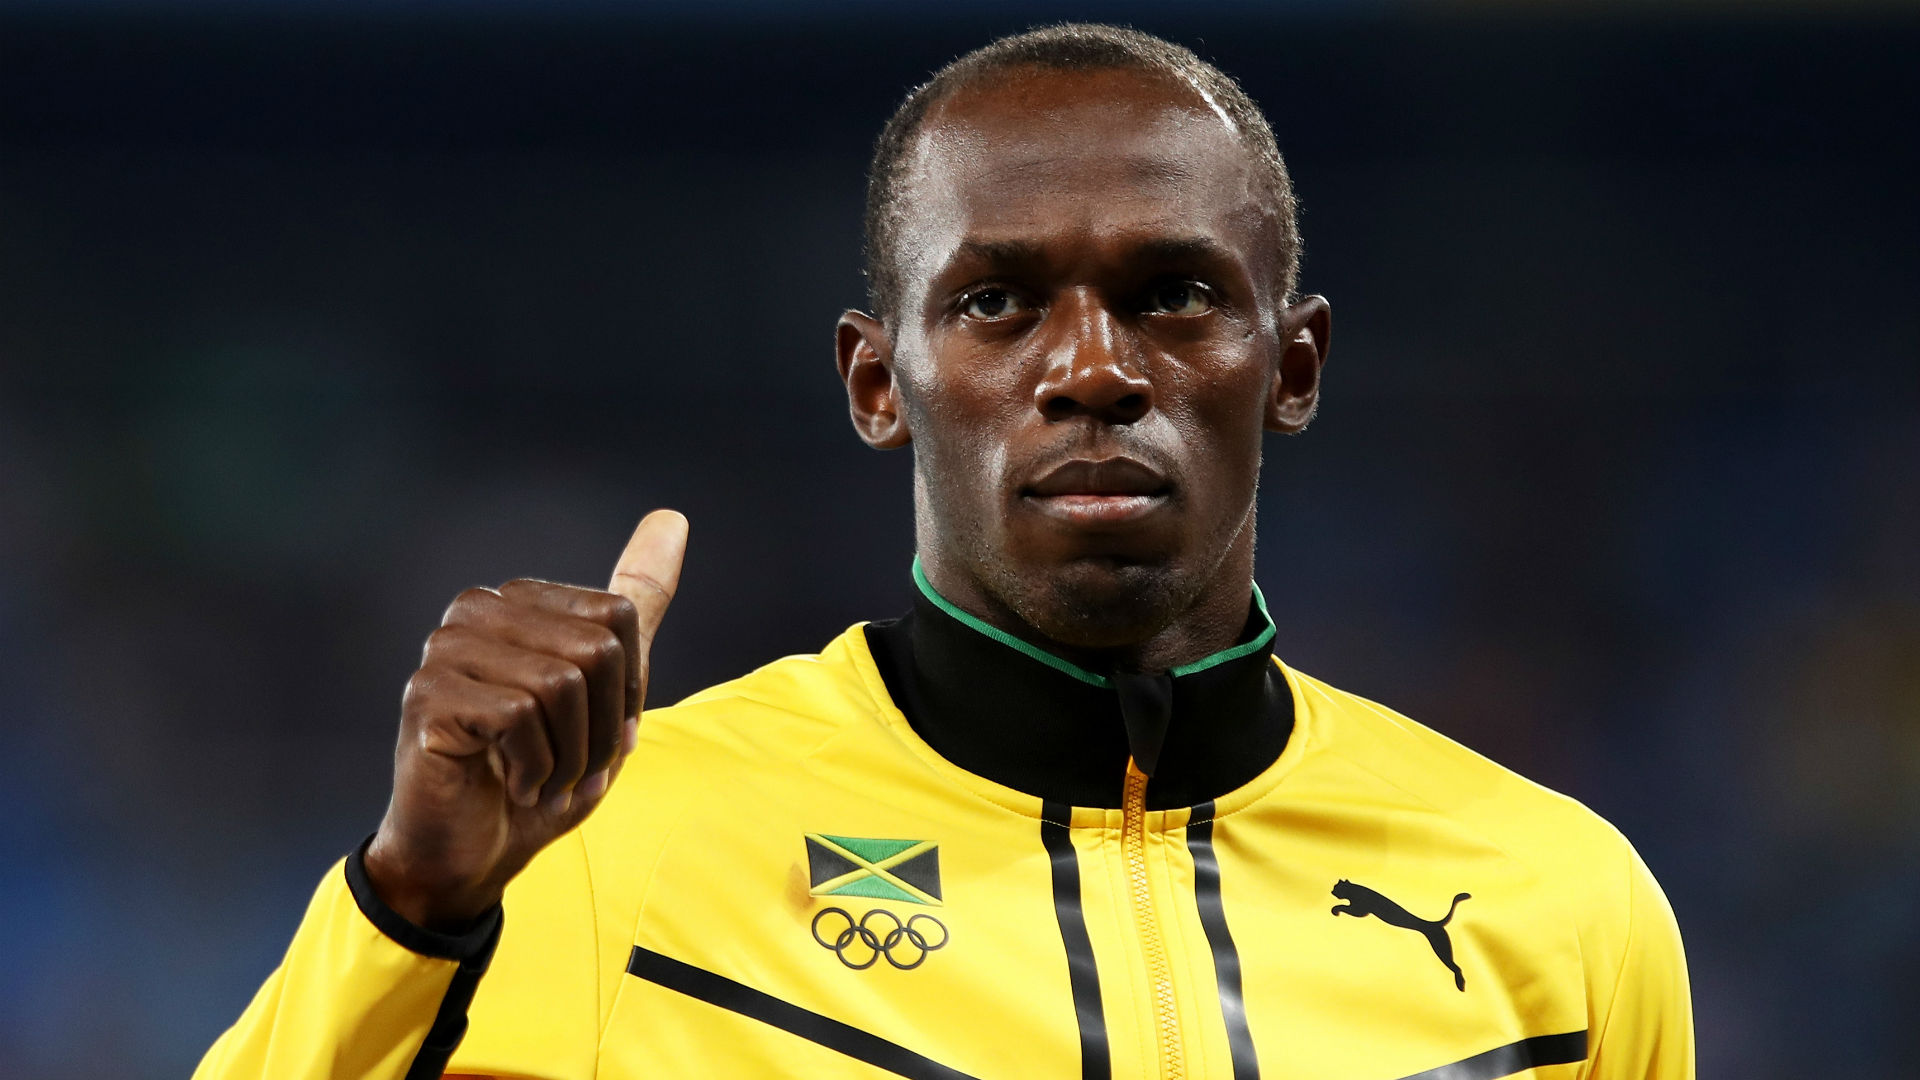 Usain Bolt to train with Bundesliga side Borussia Dortmund